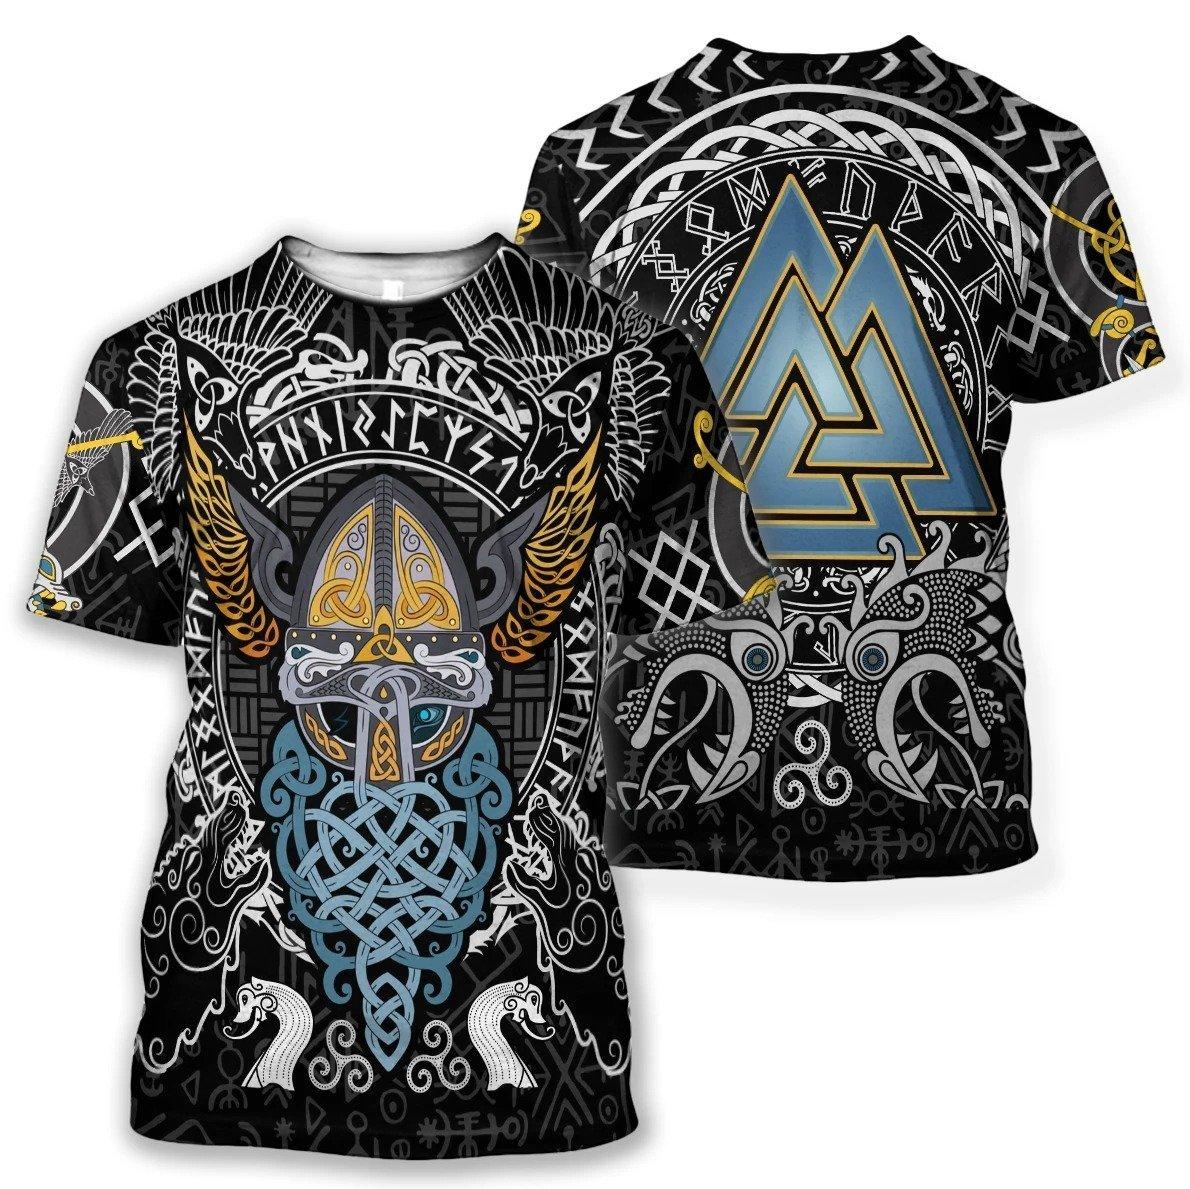 viking odin wotan tattoo all over printed tshirt